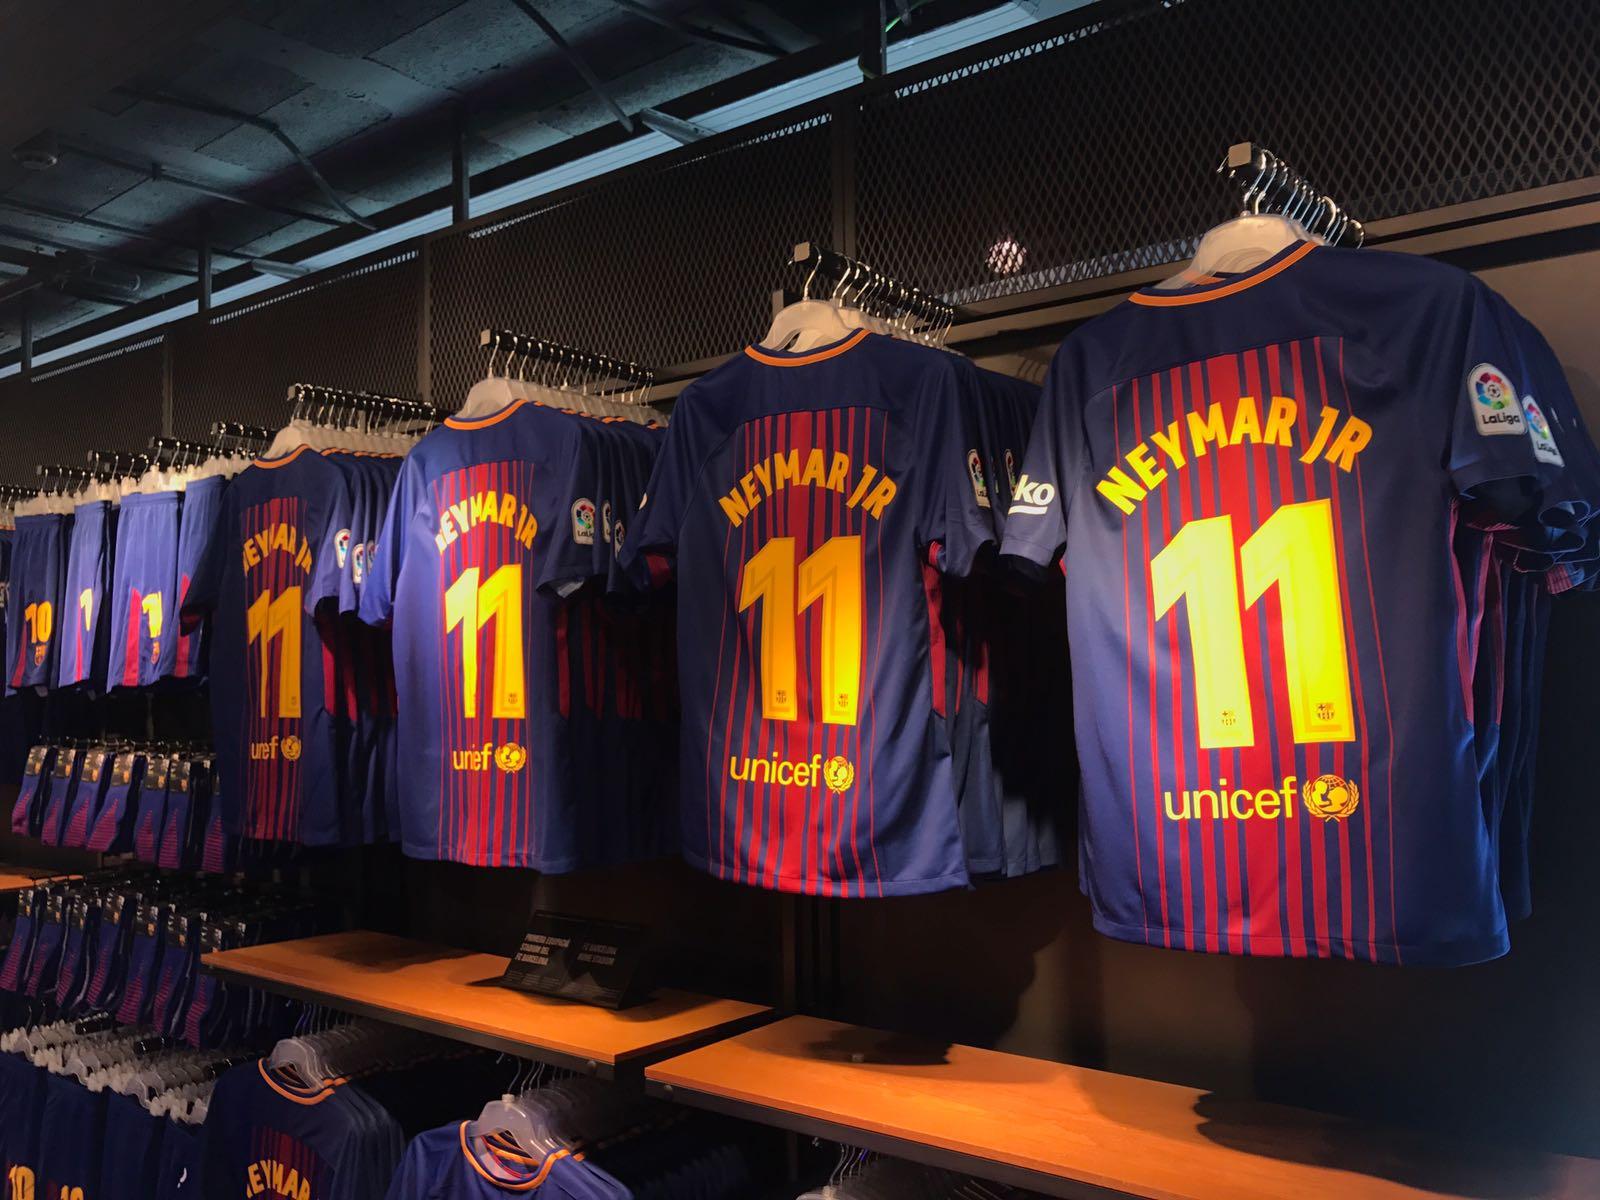 La Liga: Official: League-Wide La Liga 17-18 Font Revealed